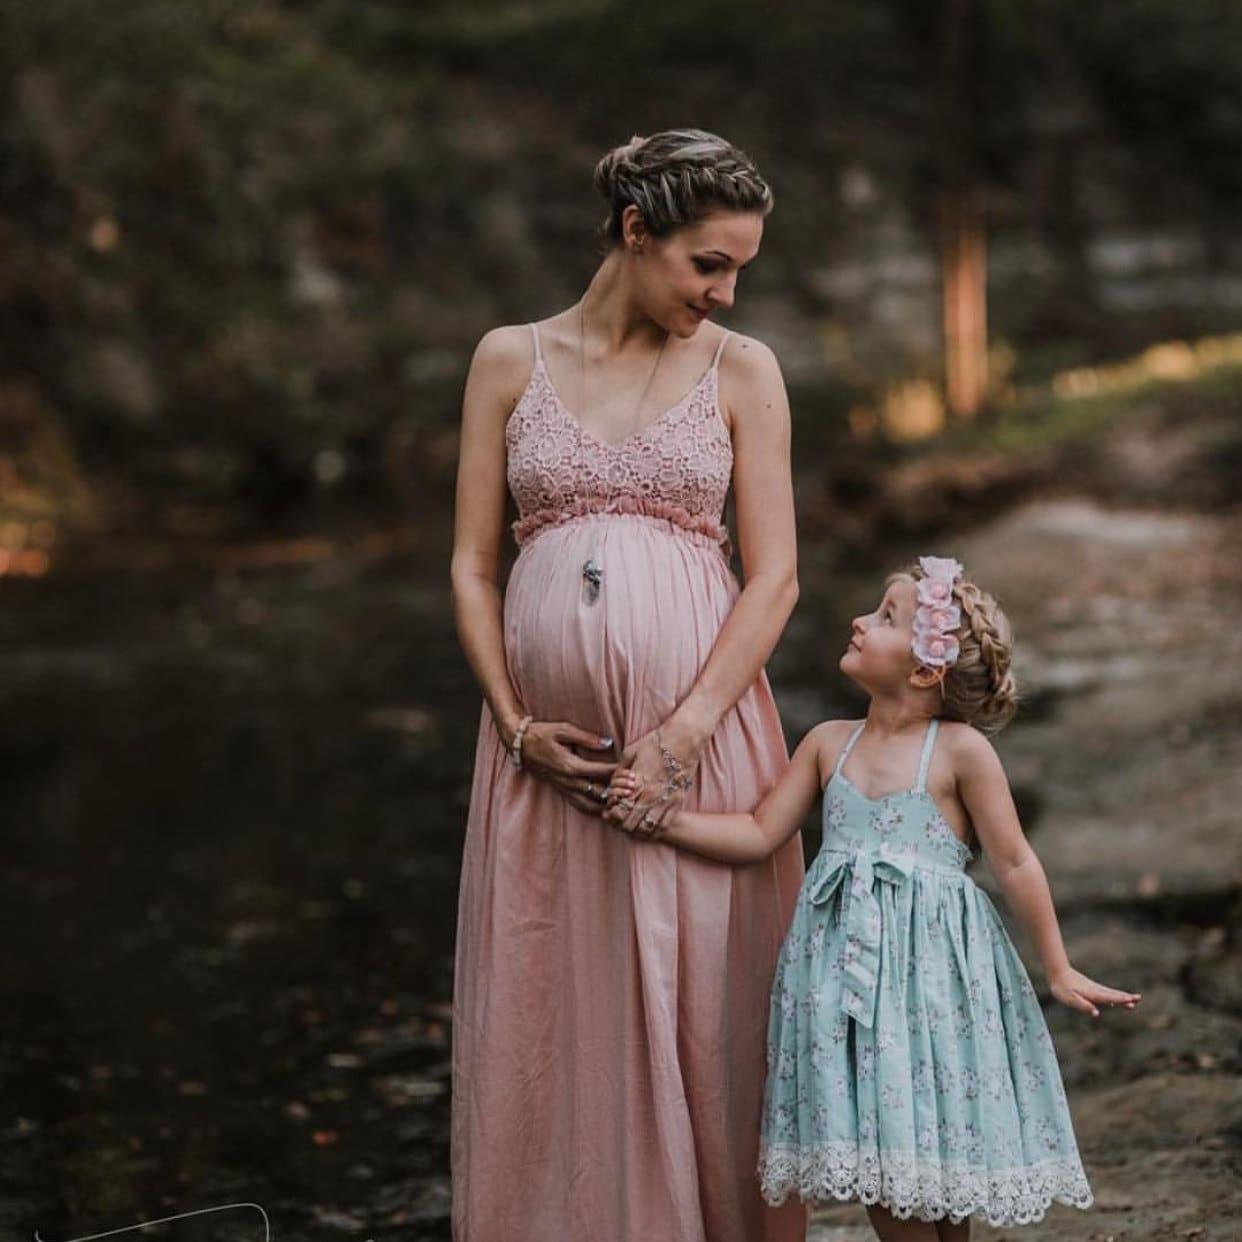 Maternity Pregnancy White Lace Dress Milk Bath Dress For Photo | Etsy